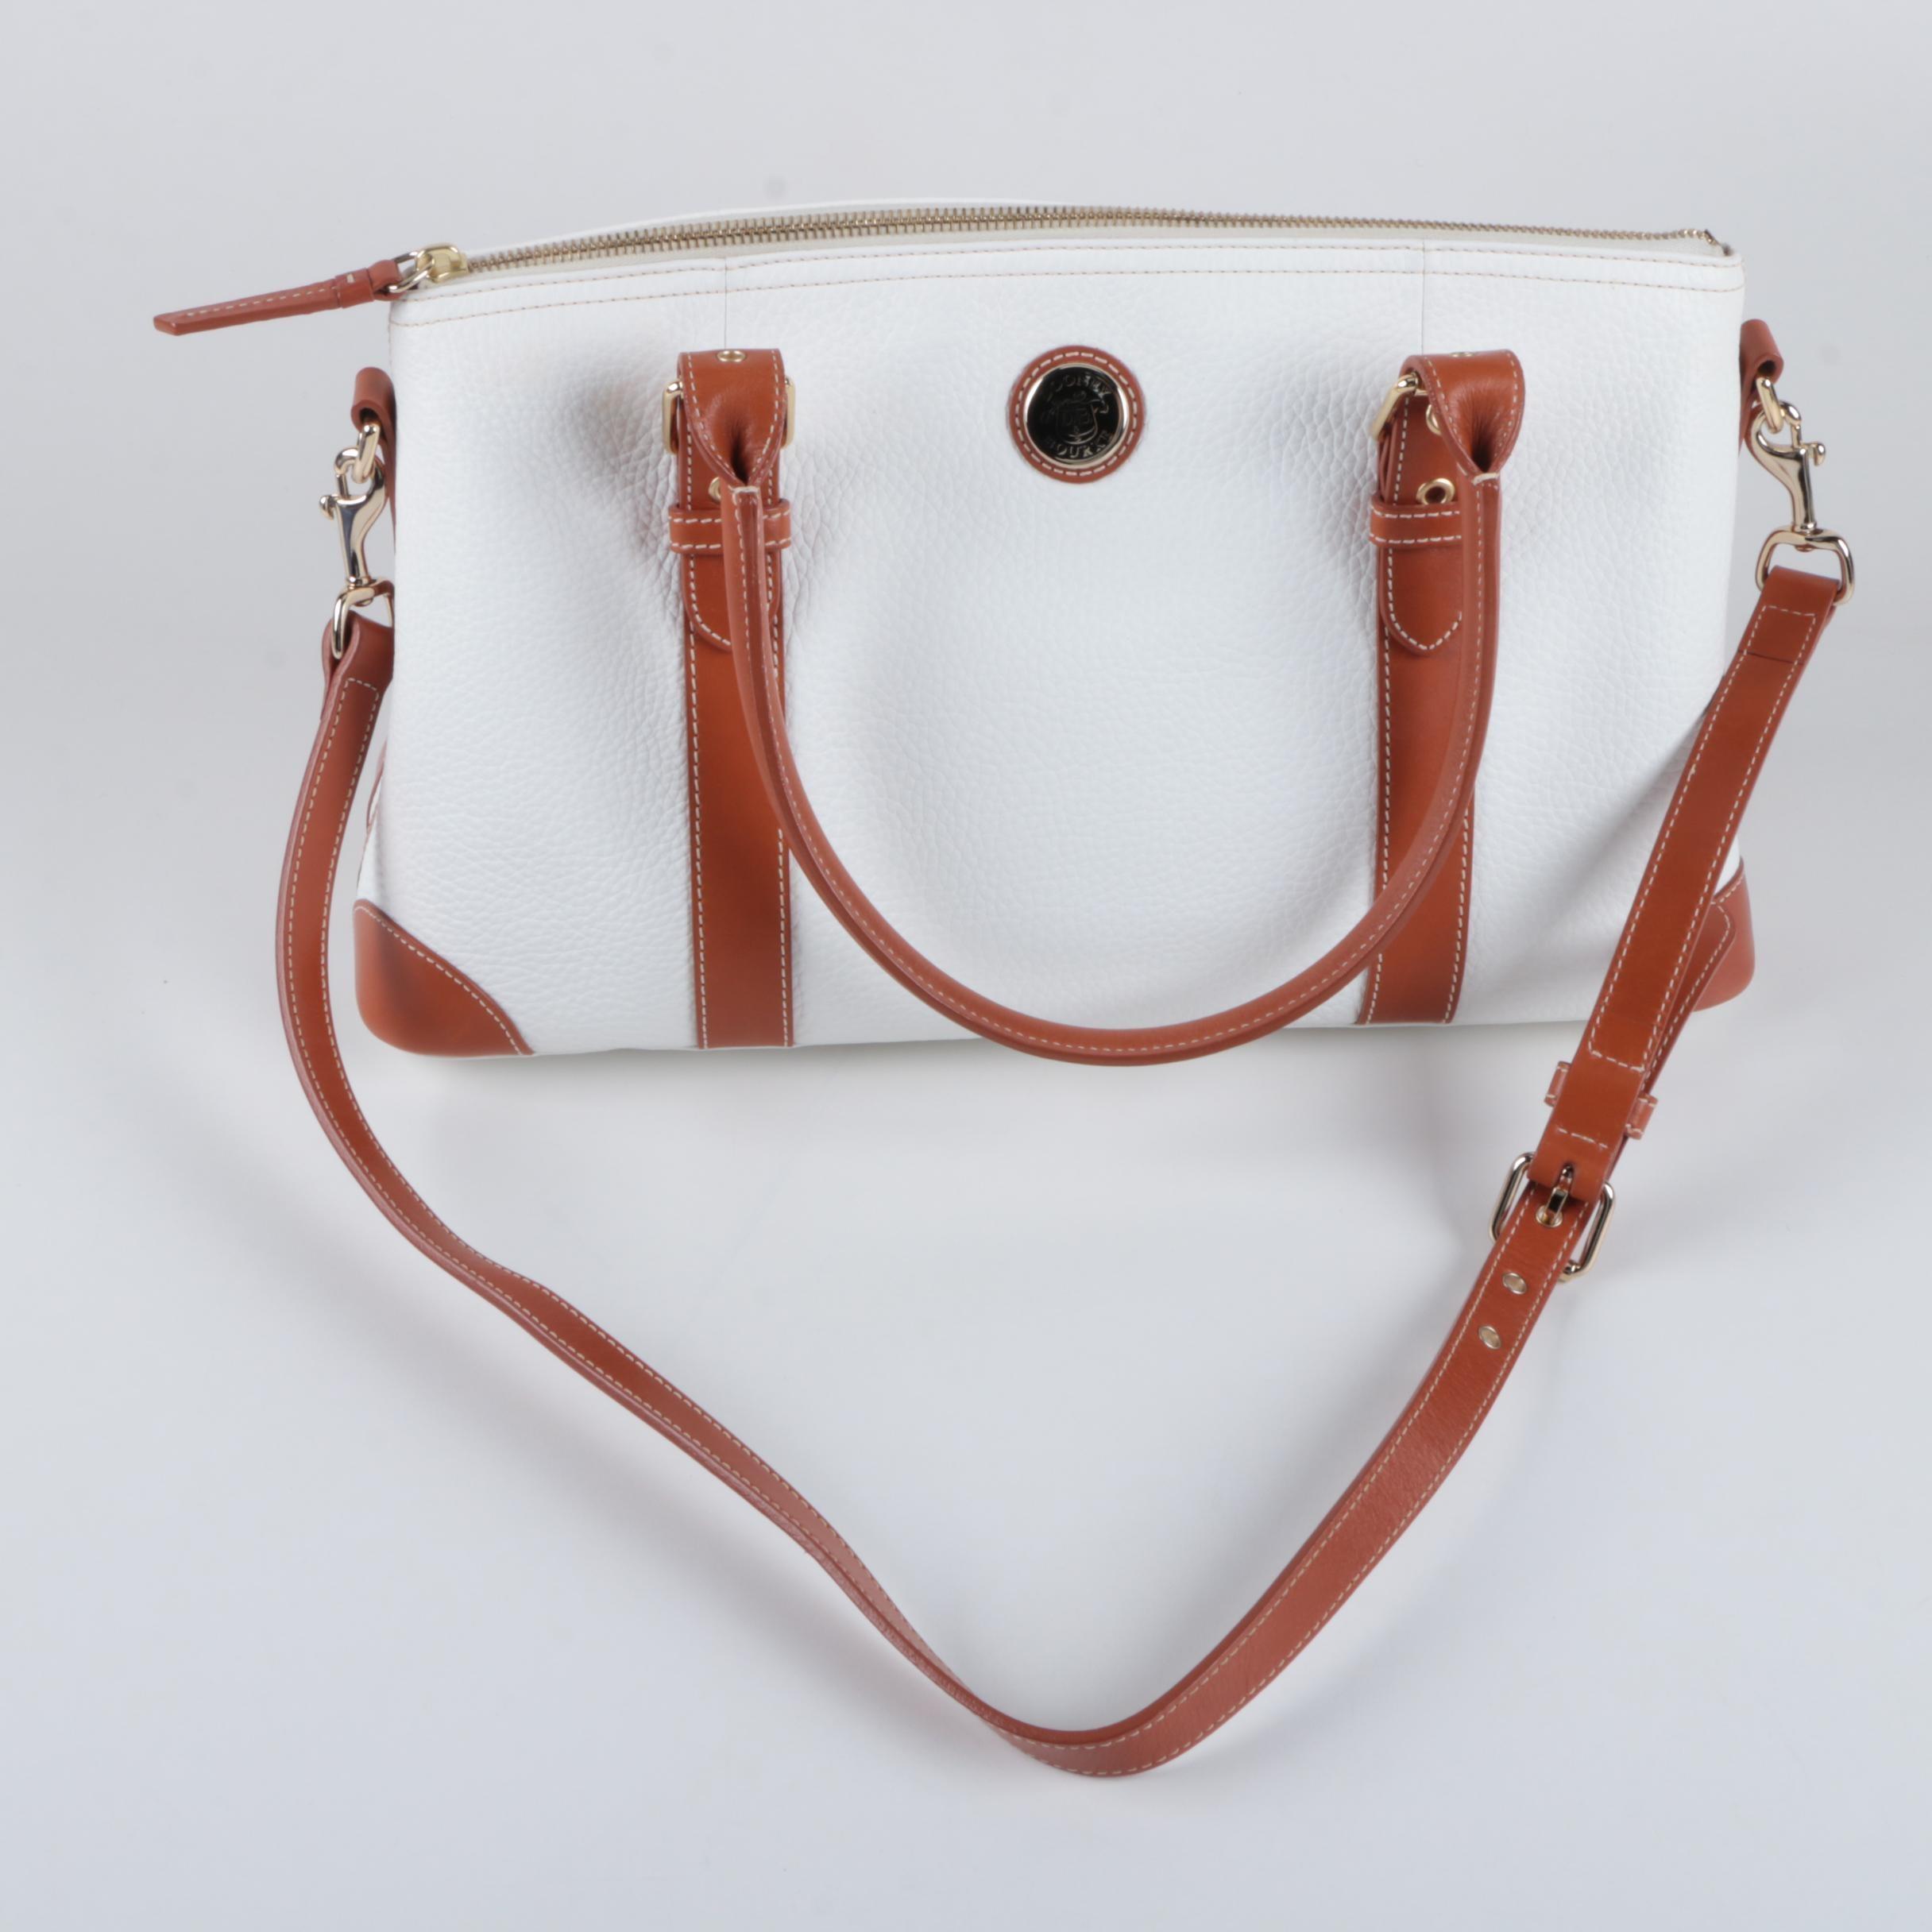 Dooney & Bourke Grained White Leather Carryall Satchel